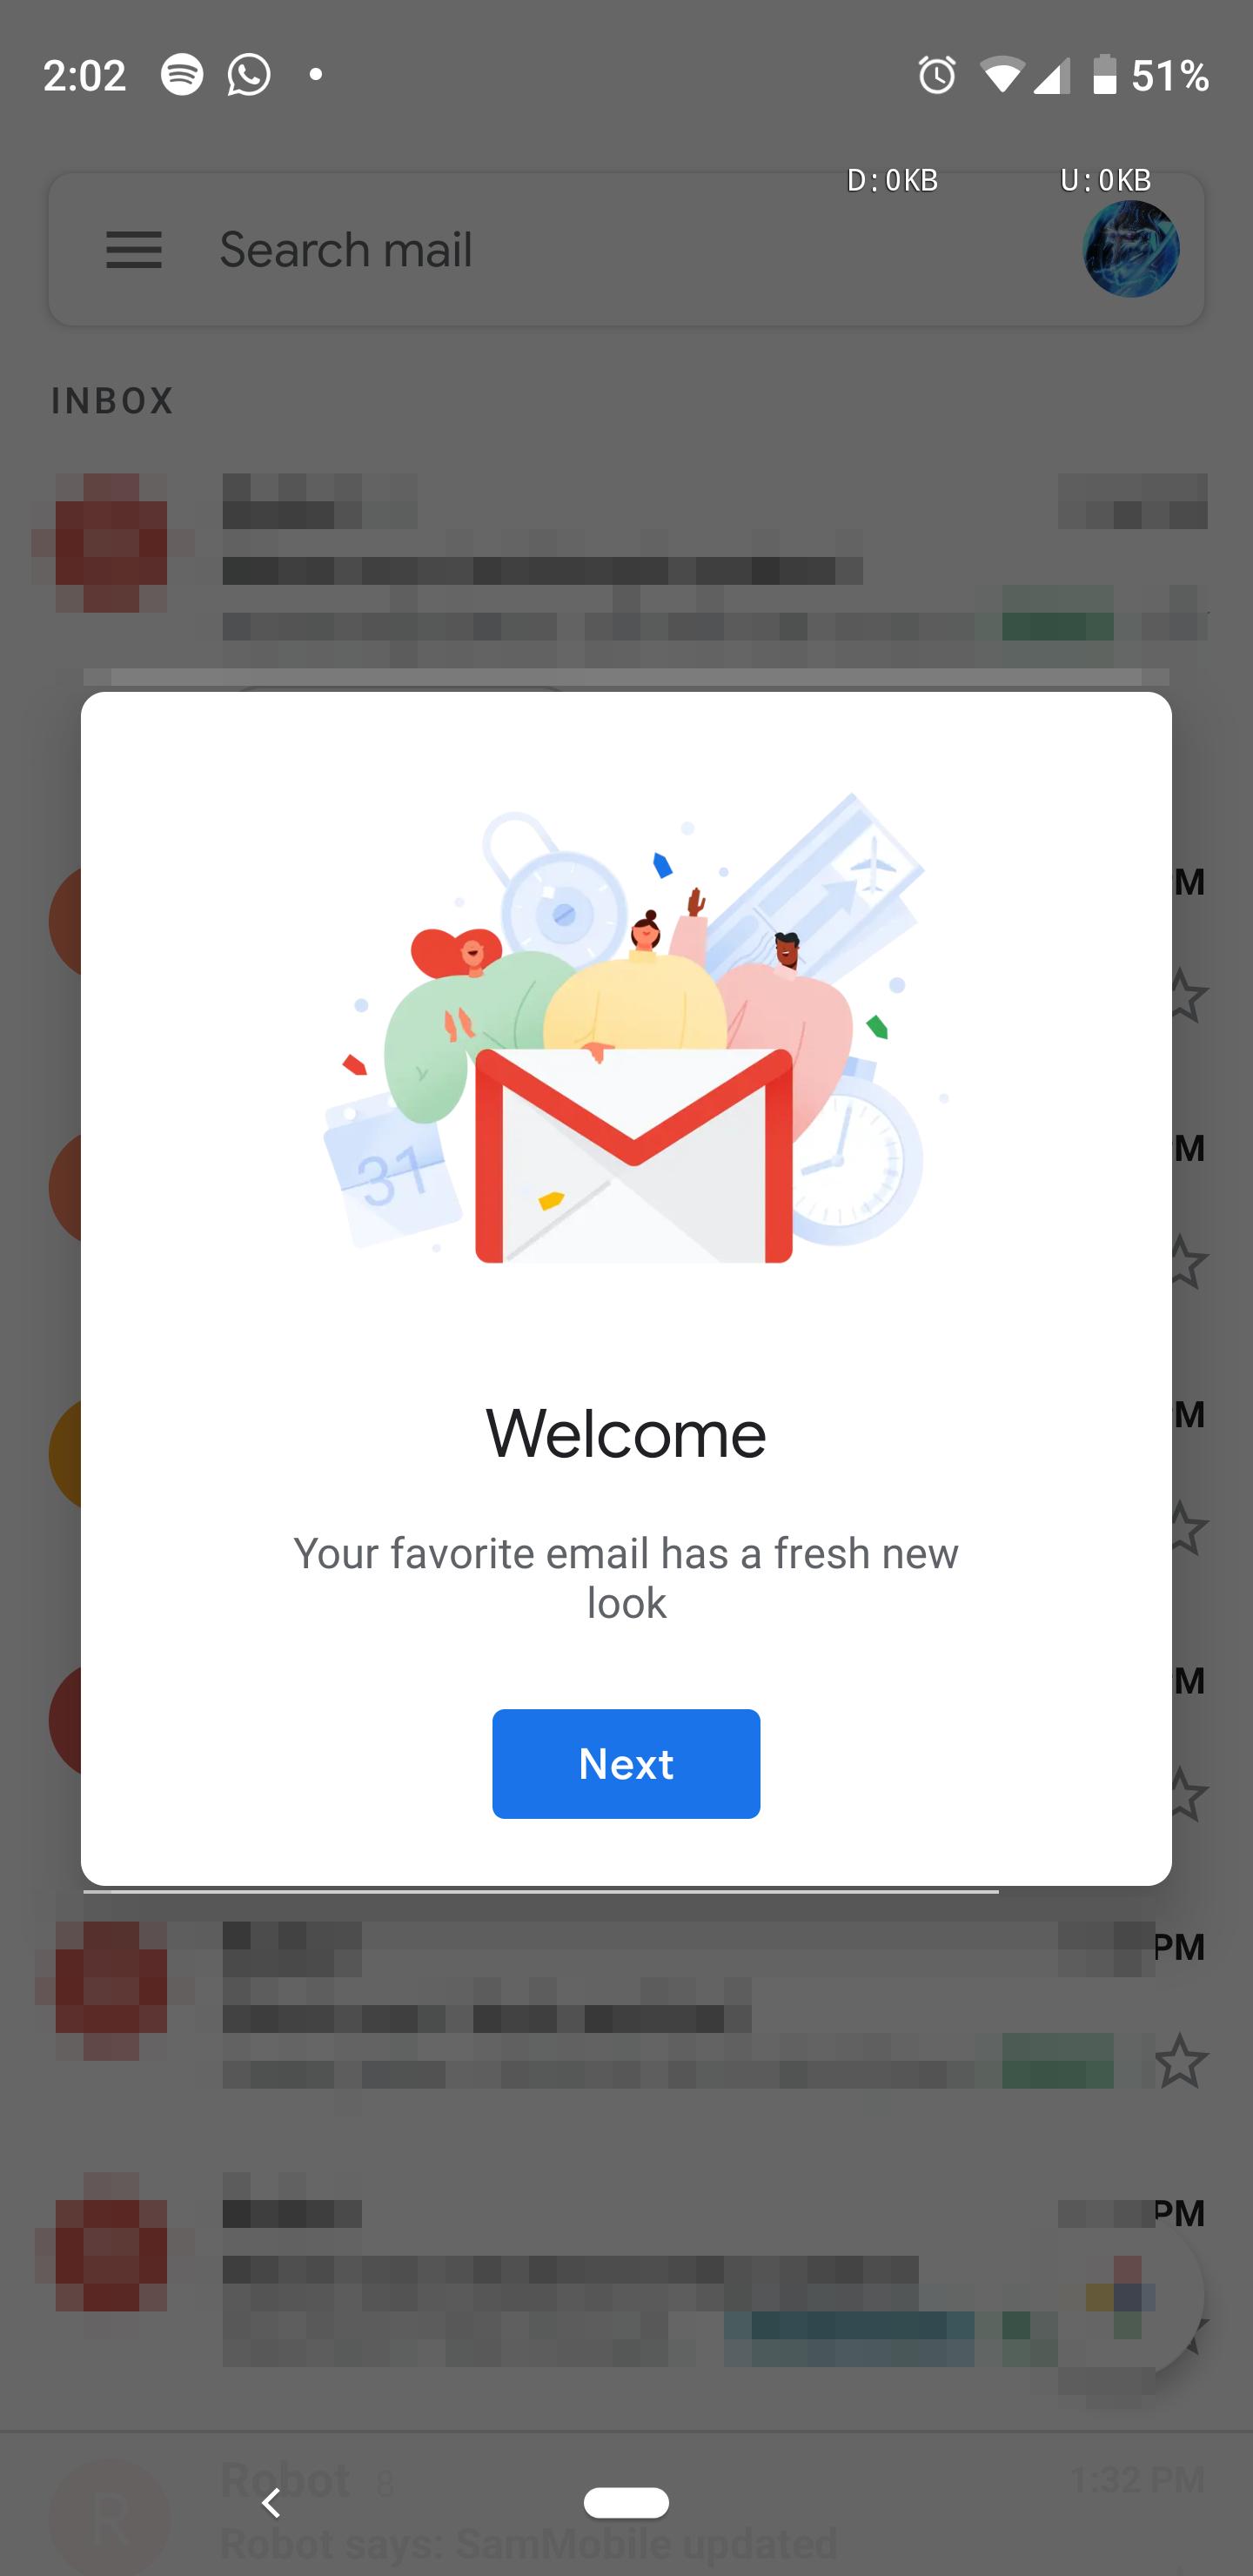 Update: APK Download] Blindingly bright Google Material